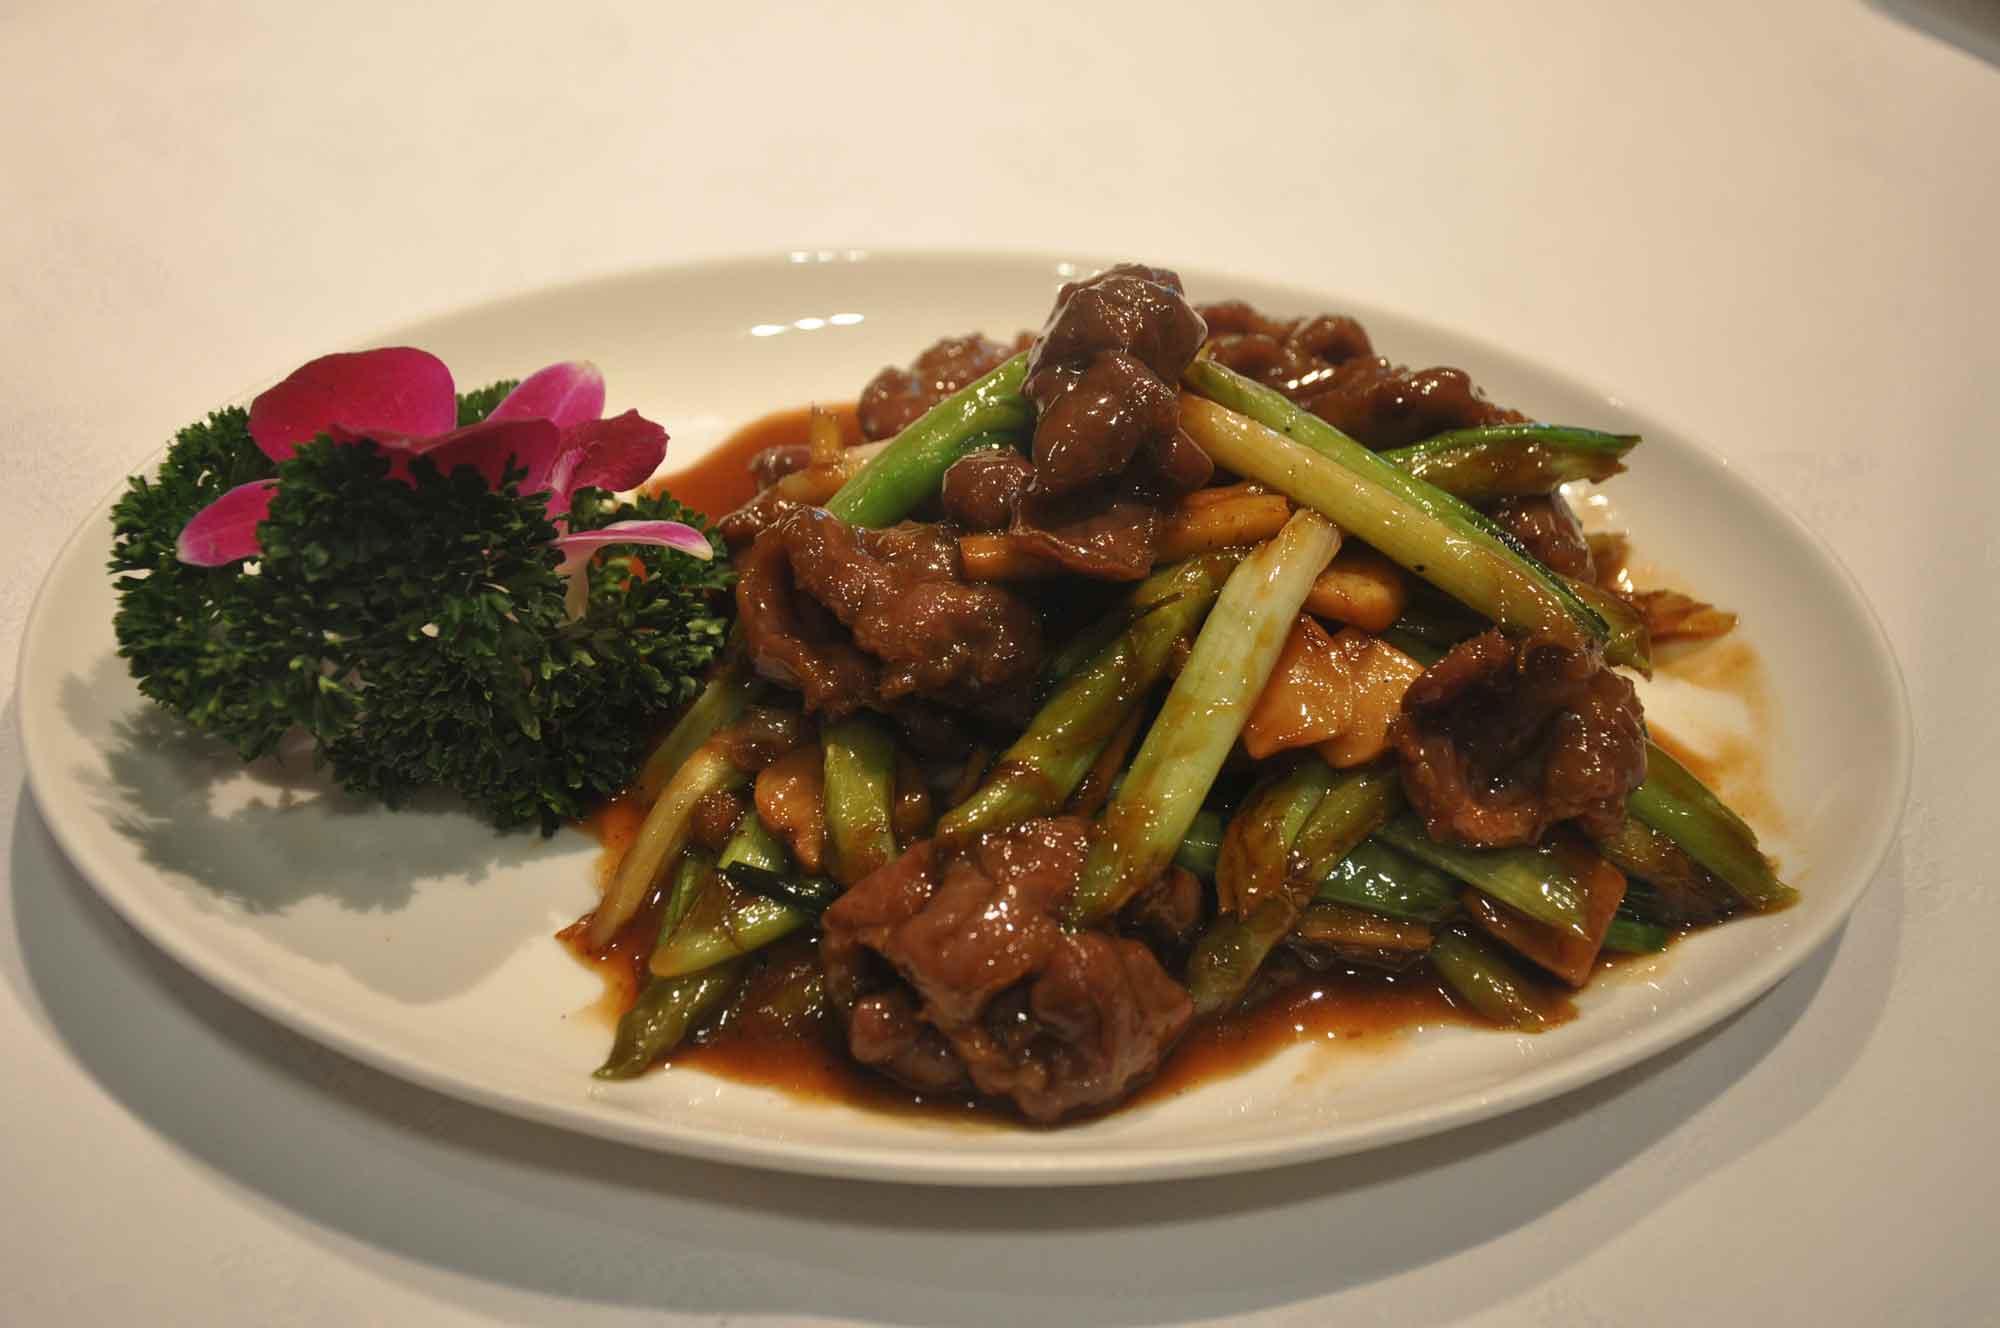 Tim's Kitchen Macau sauteed beef tenderloin with ginger